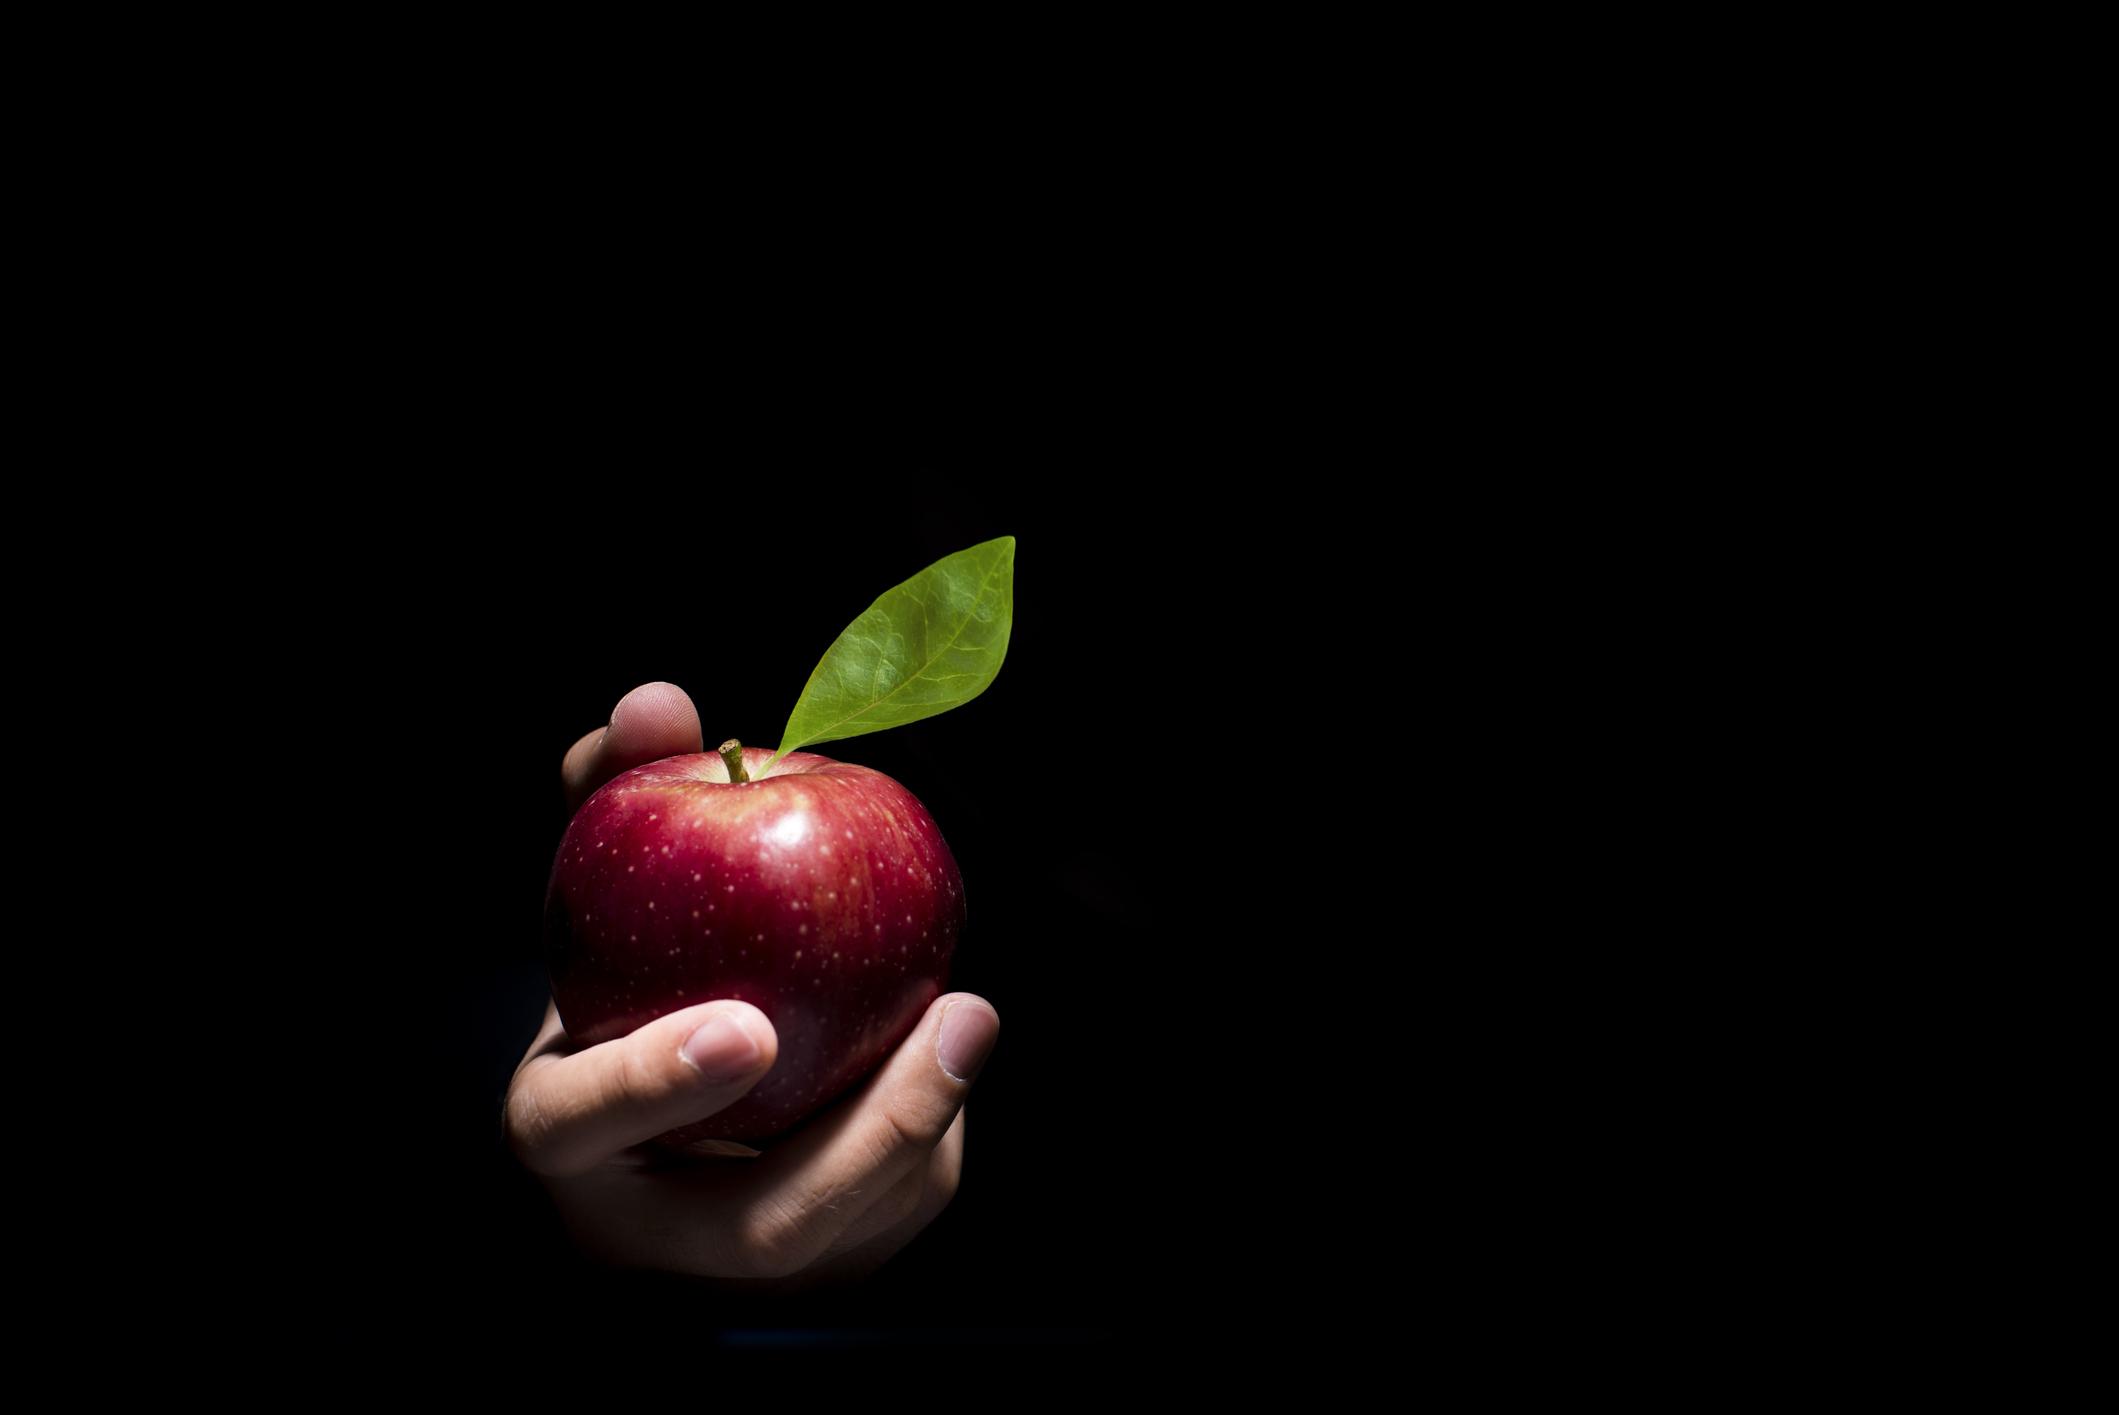 Картинка с яблоком про травлю